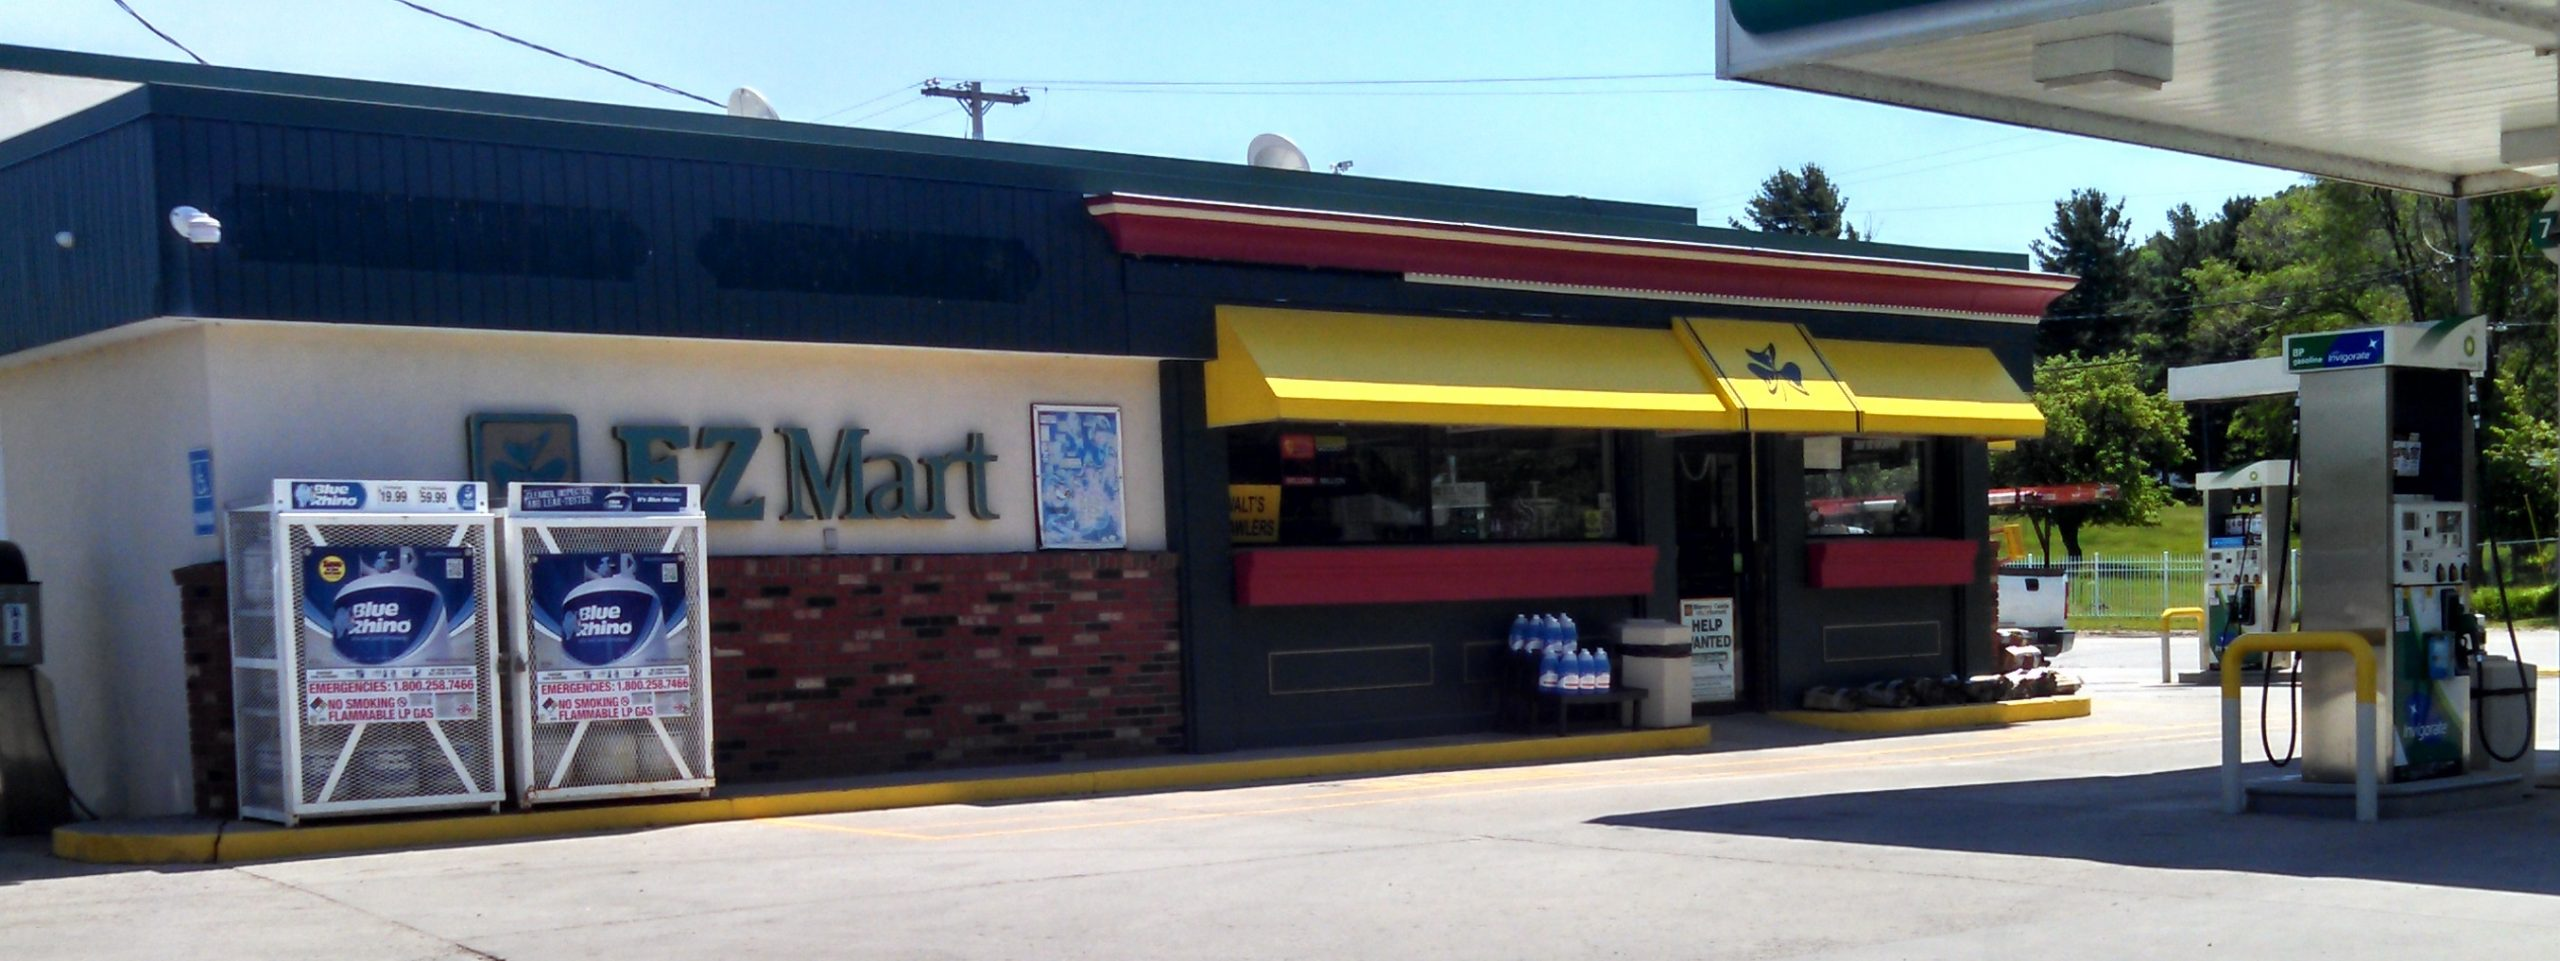 EZ Mart convenient store + gas station in Empire storefront